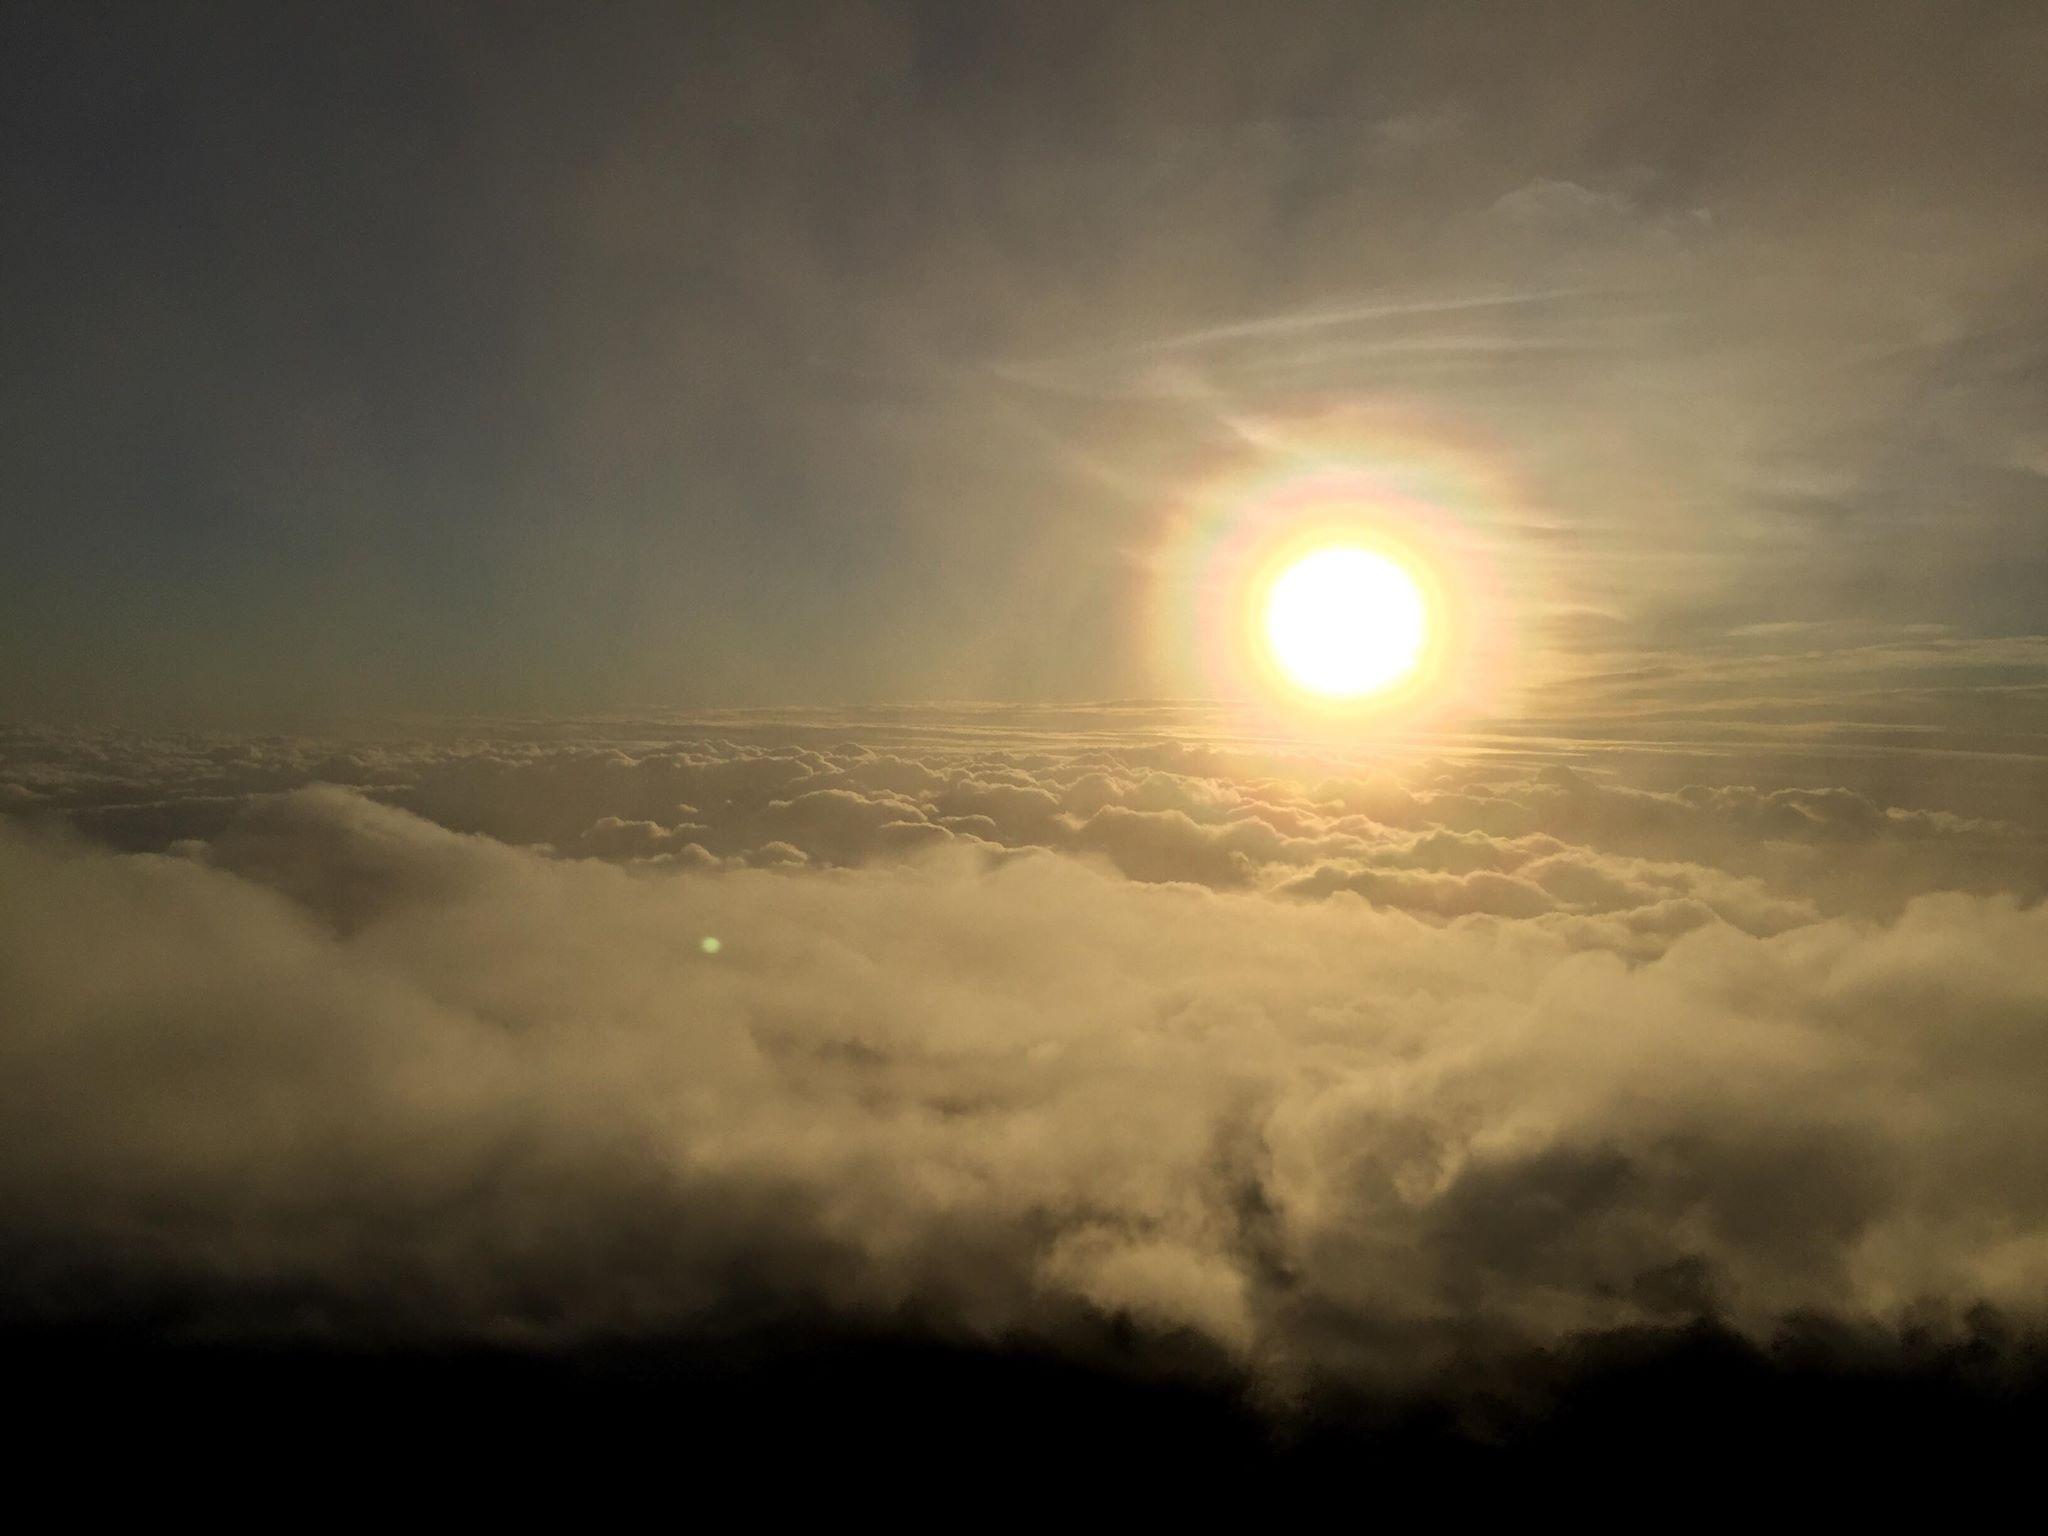 The Typhoon on Mt Fuji